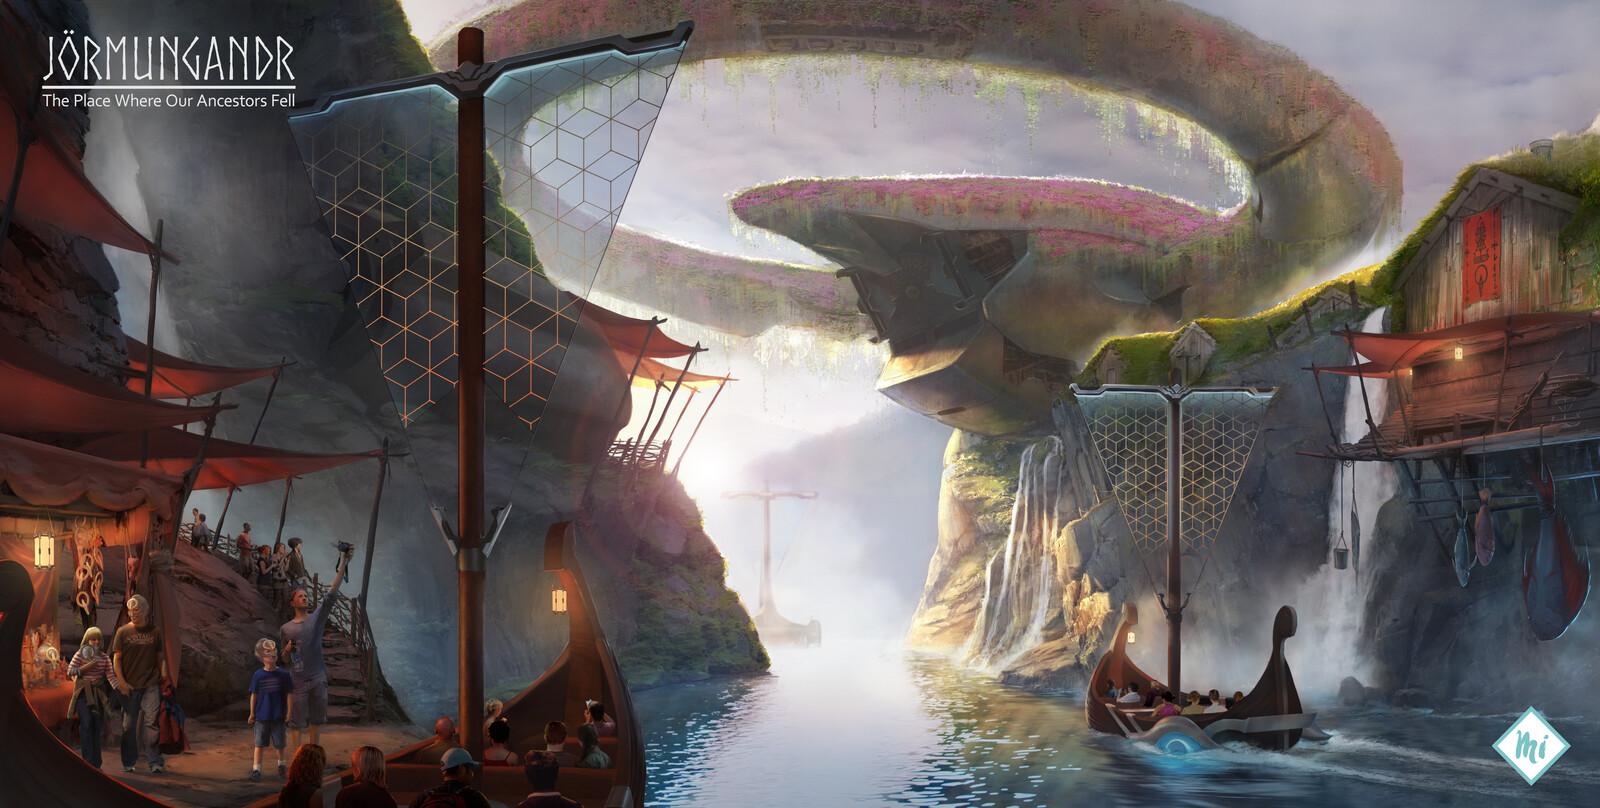 Jörmungandr Project: A Sci-fi Viking Theme Park Concept